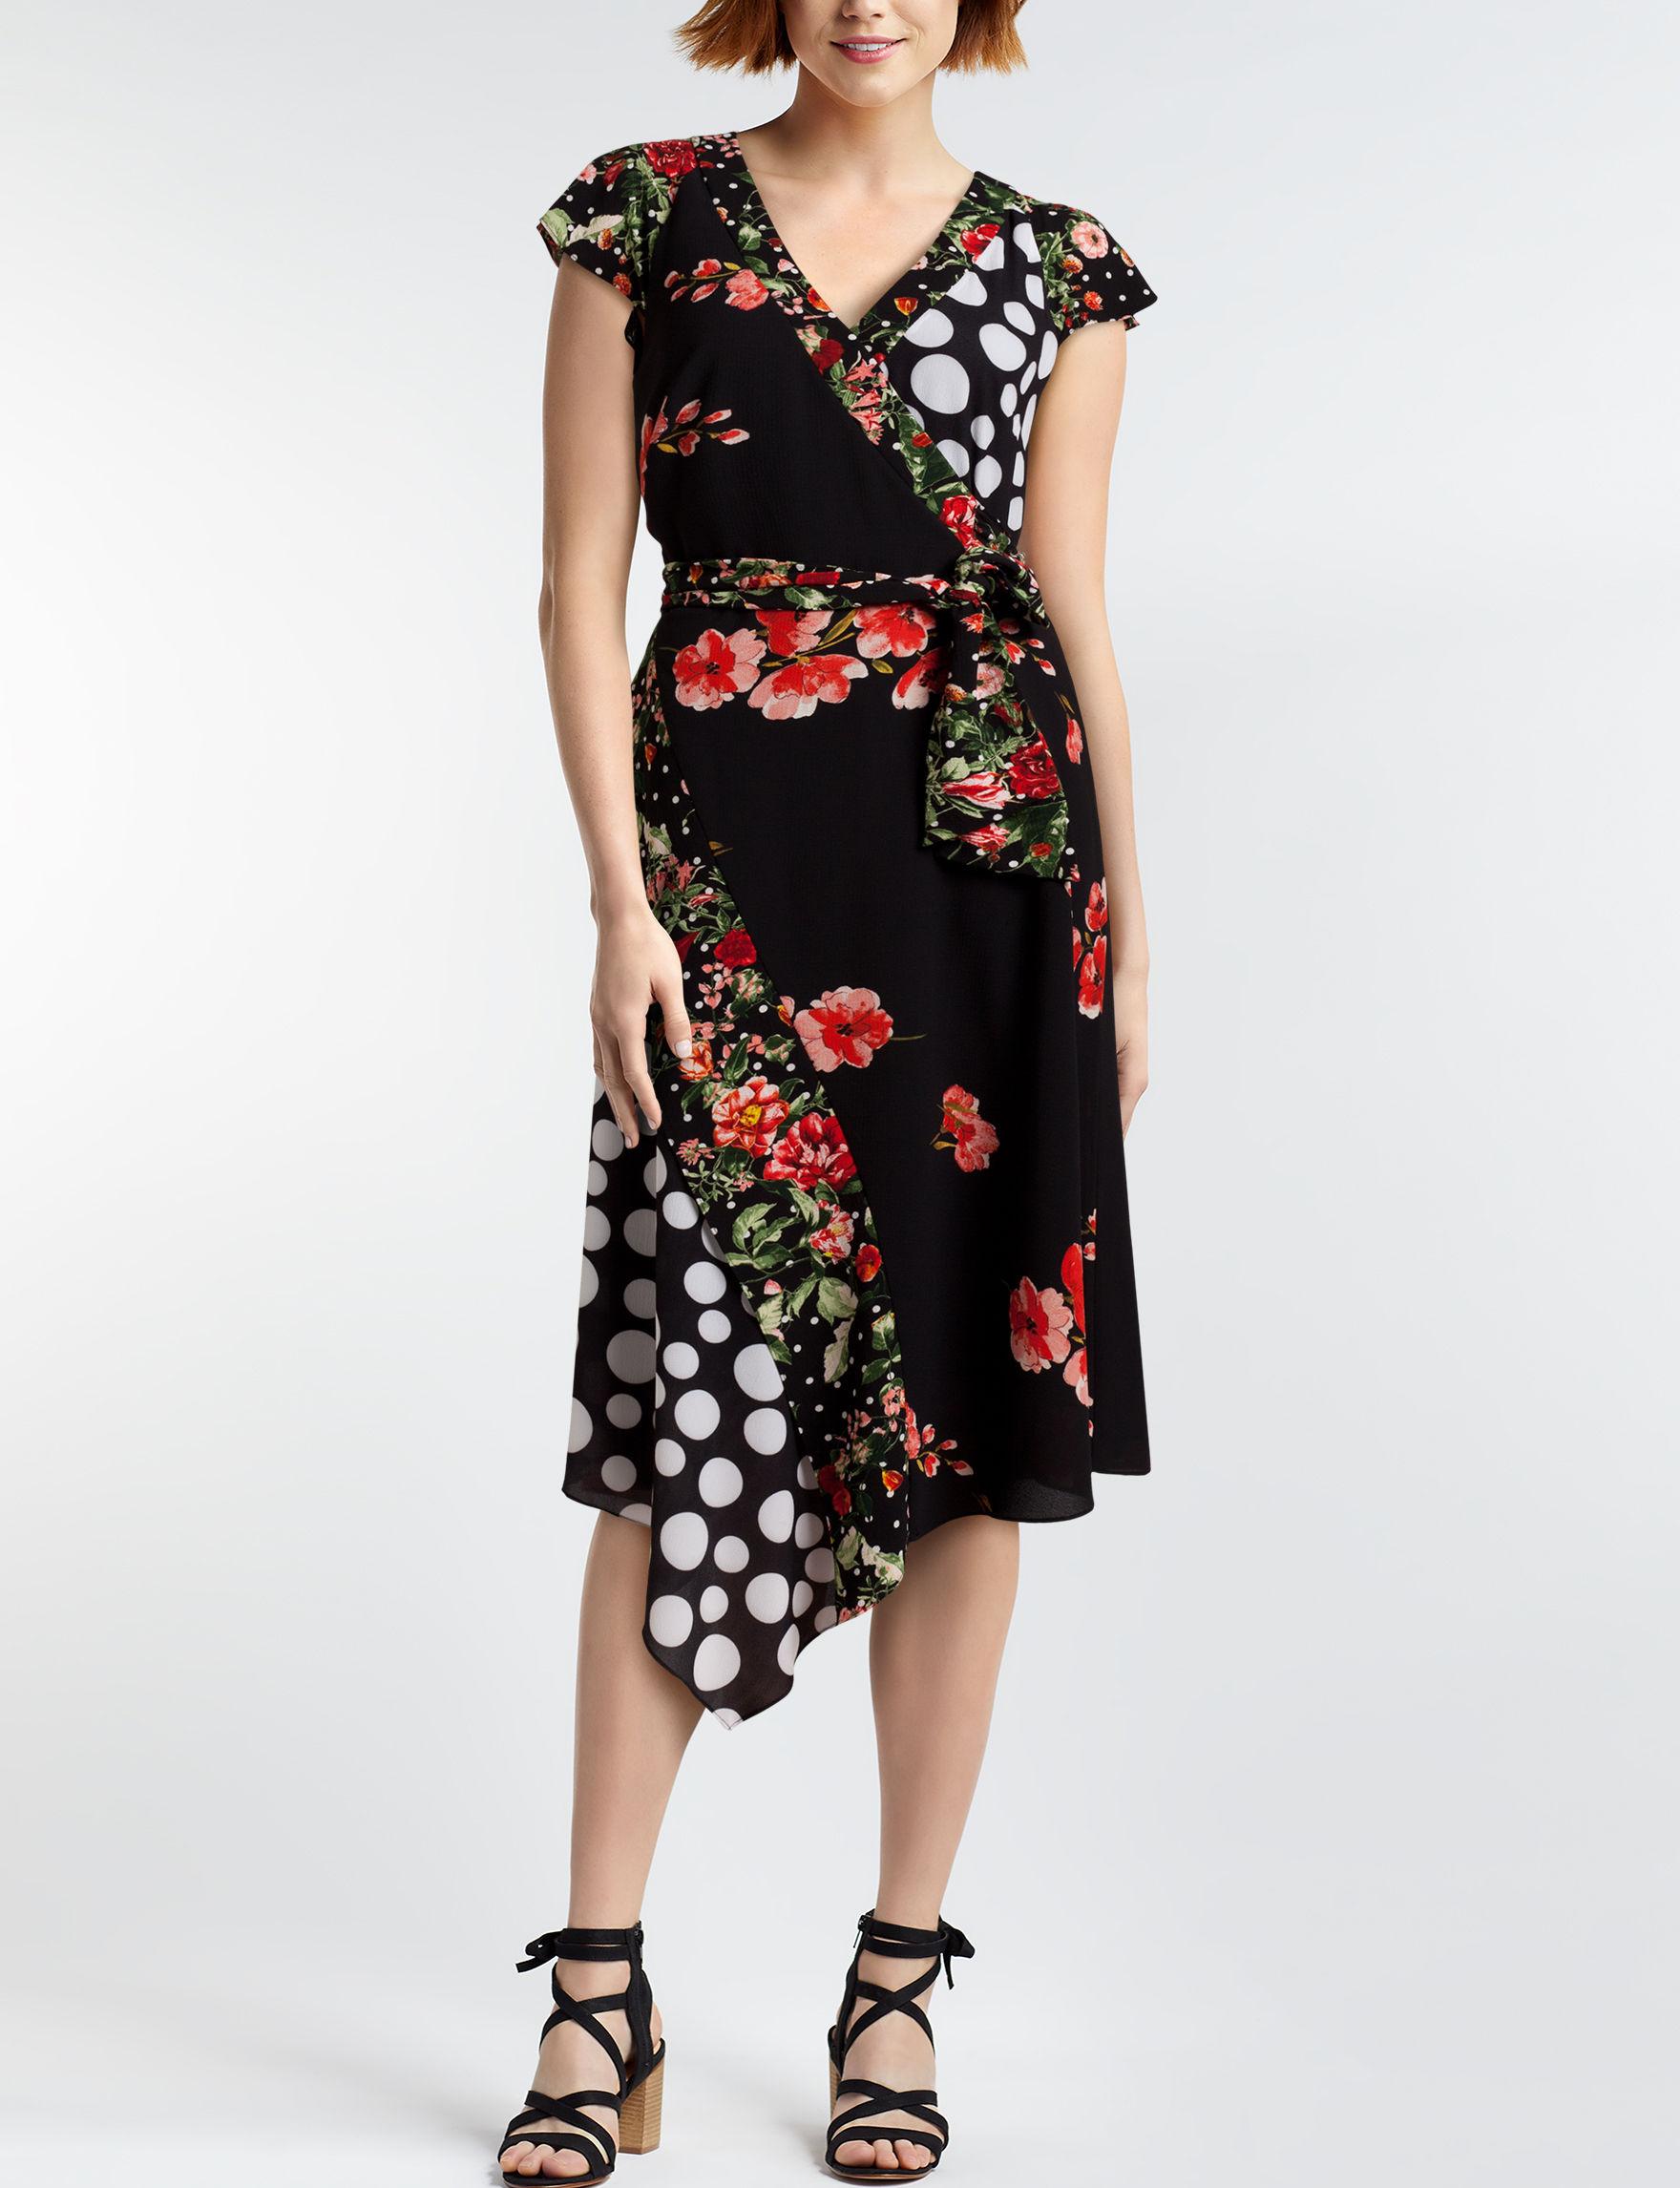 Sangria Black Multi Everyday & Casual A-line Dresses Fit & Flare Dresses